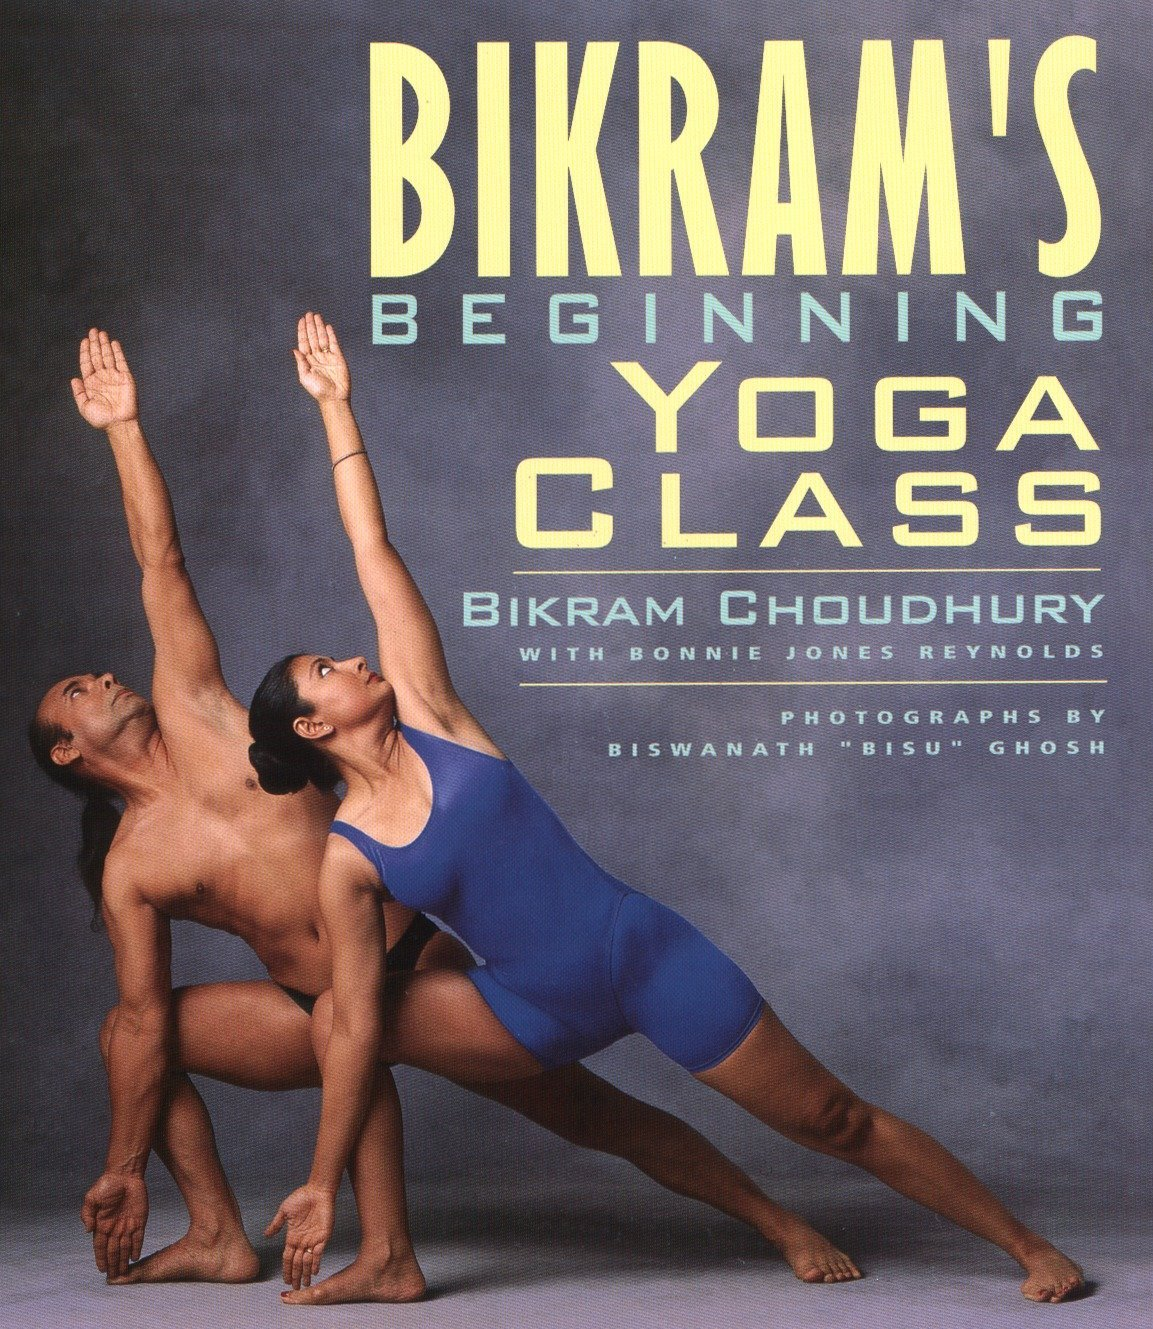 Bikram S Beginning Yoga Class Second Edtion Bonnie Jones Reynolds Bikram Choudhury 9781585420209 Amazon Com Books